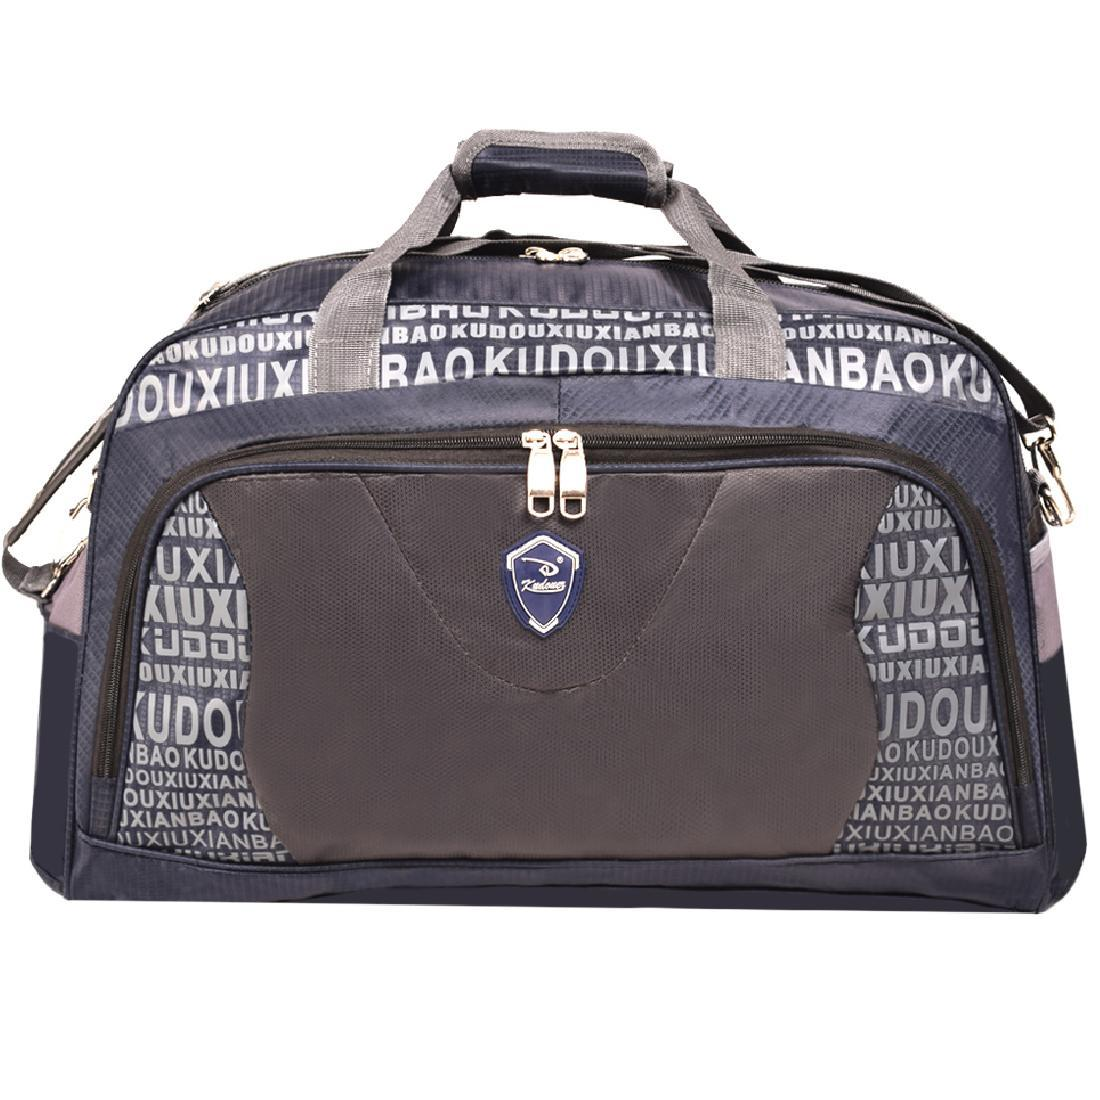 Дорожная сумка Kudouer (нейлон)  52х35х27 цвет синий  кс1215Ссин